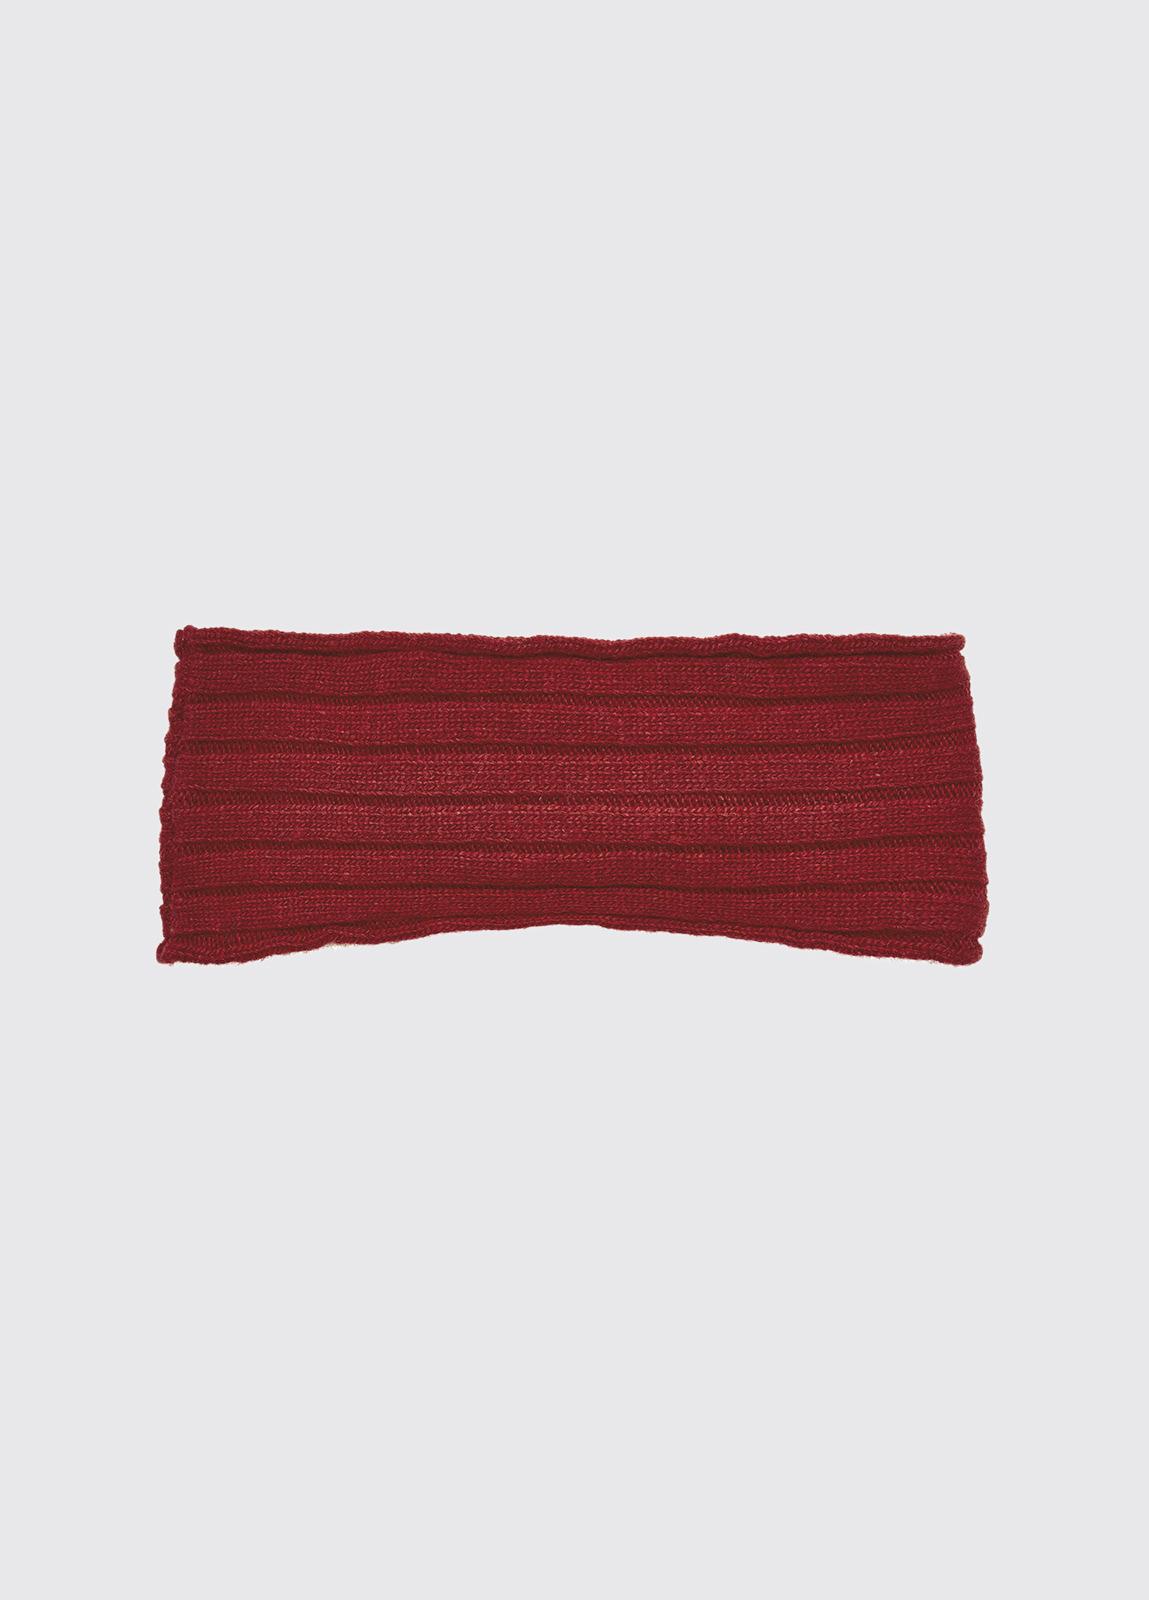 Foley Knitted Headband - Ruby